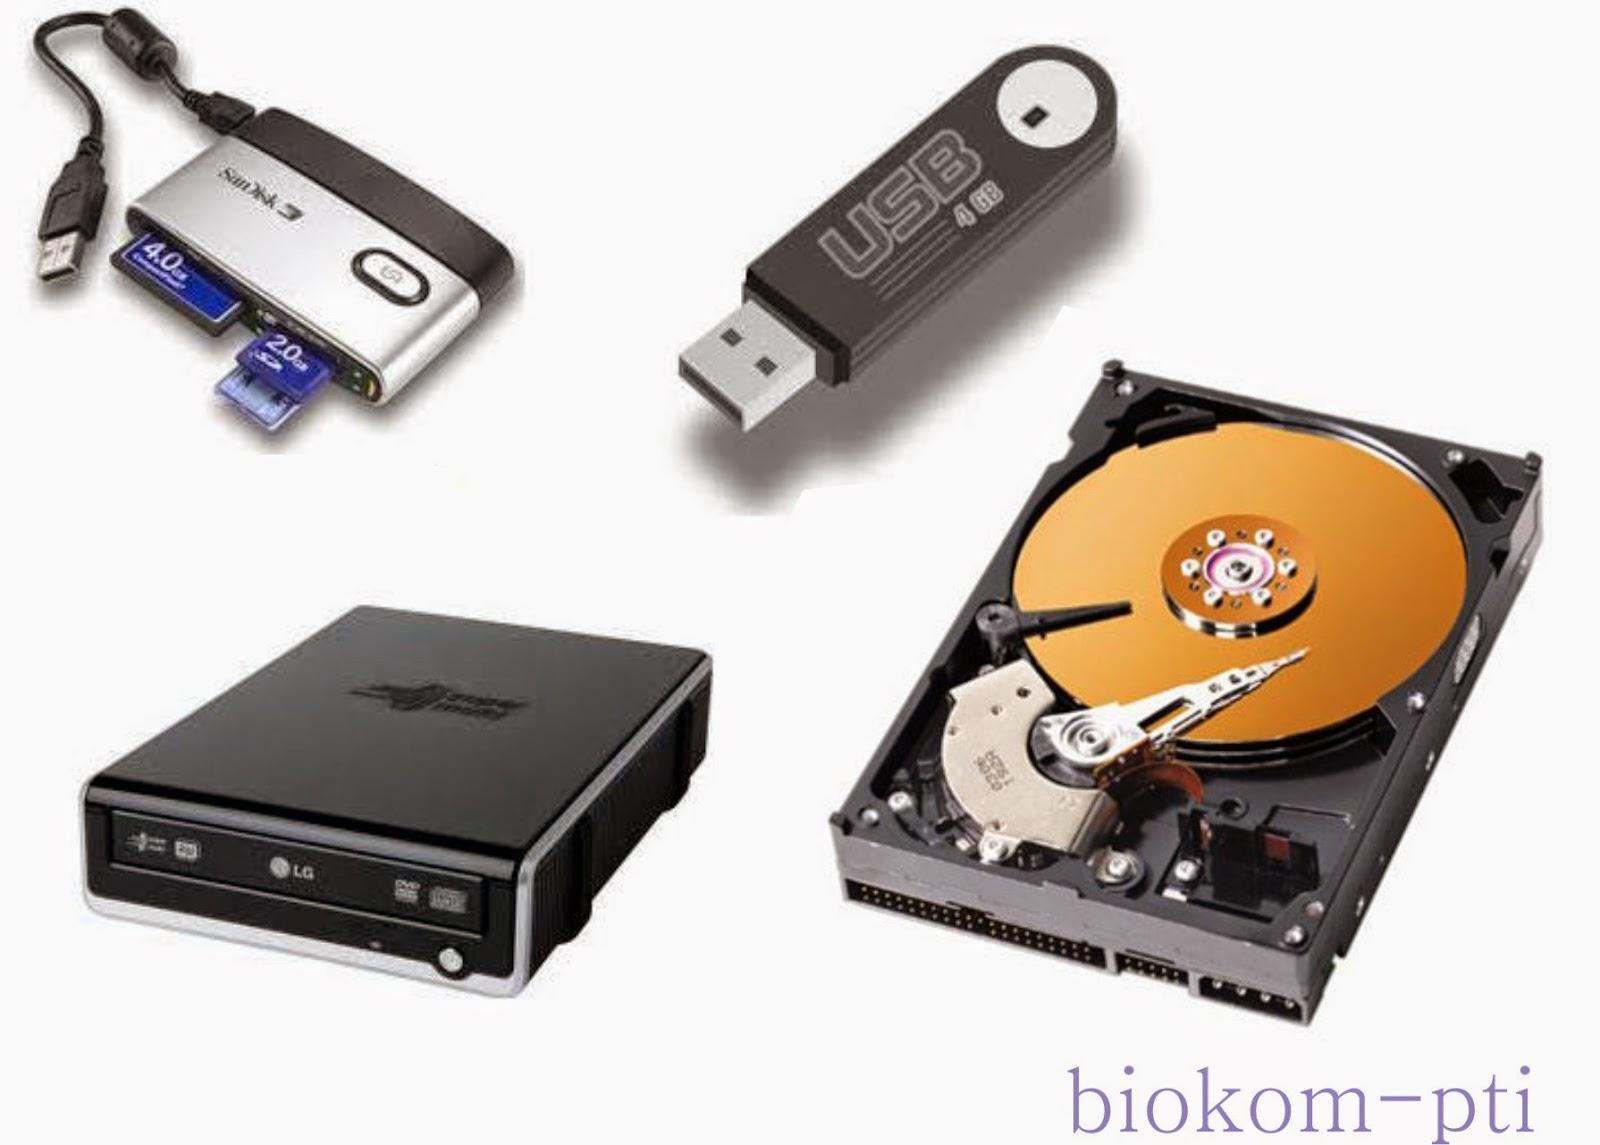 http://biokom-pti.blogspot.com/2013/10/storage-device.html